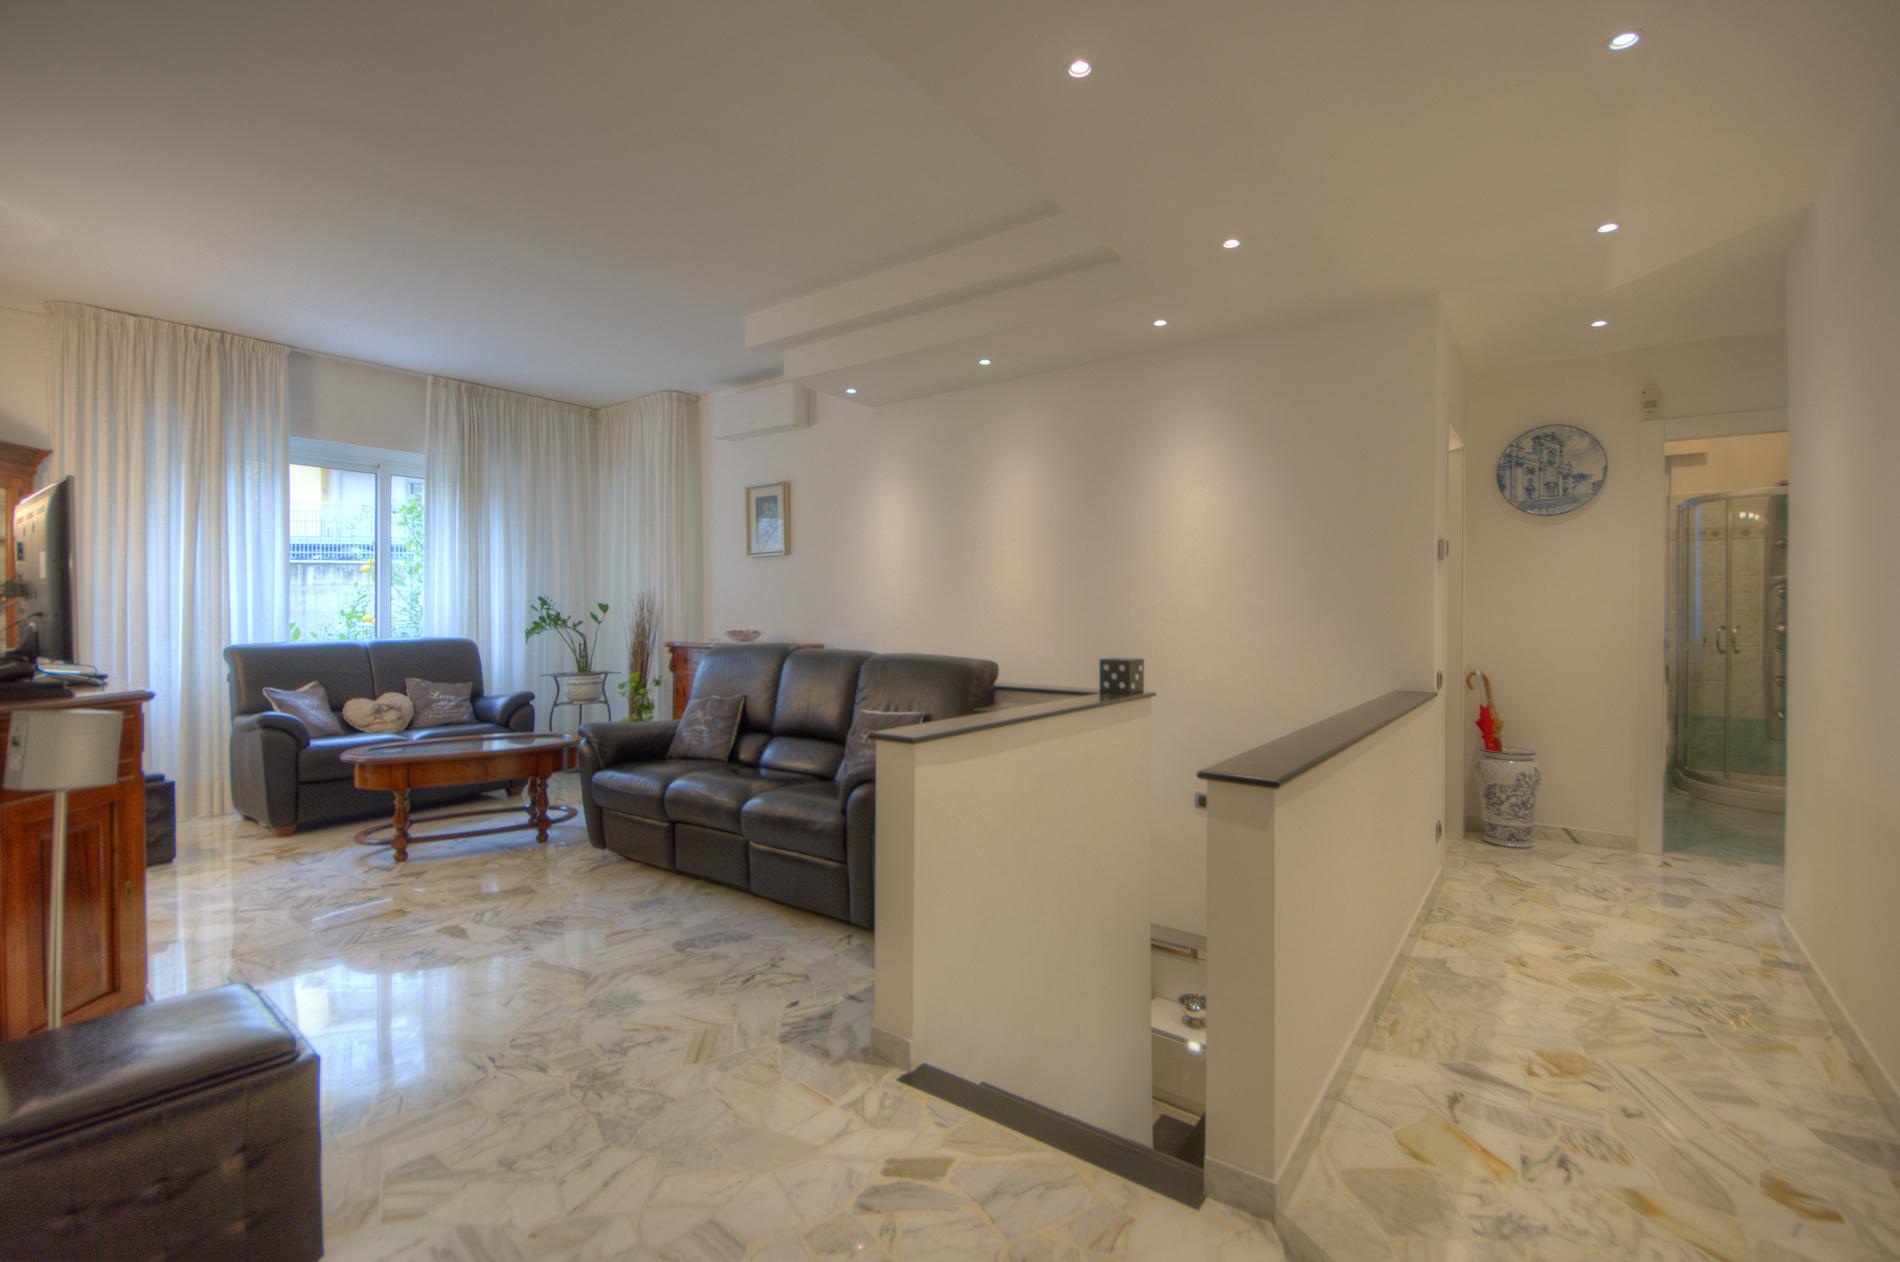 Appartamento - Valloria, Savona